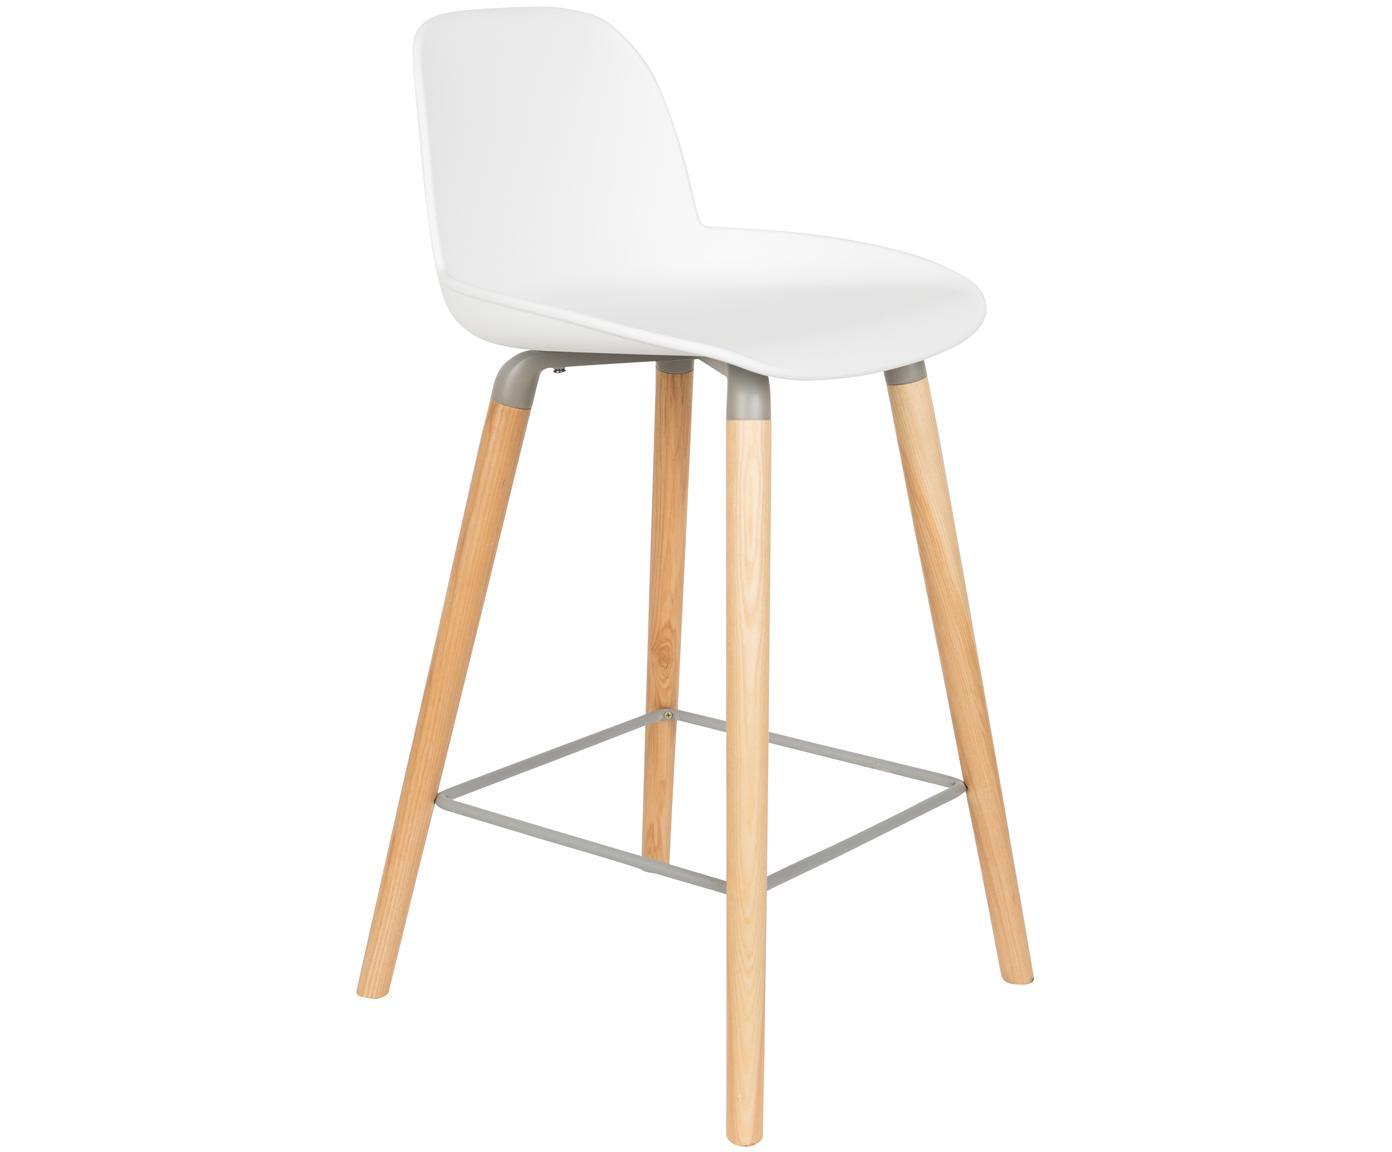 Taburete alto Albert Kuip, Asiento: polipropileno, Patas: madera de fresno, Blanco, gris, ceniza, An 45 x Al 89 cm